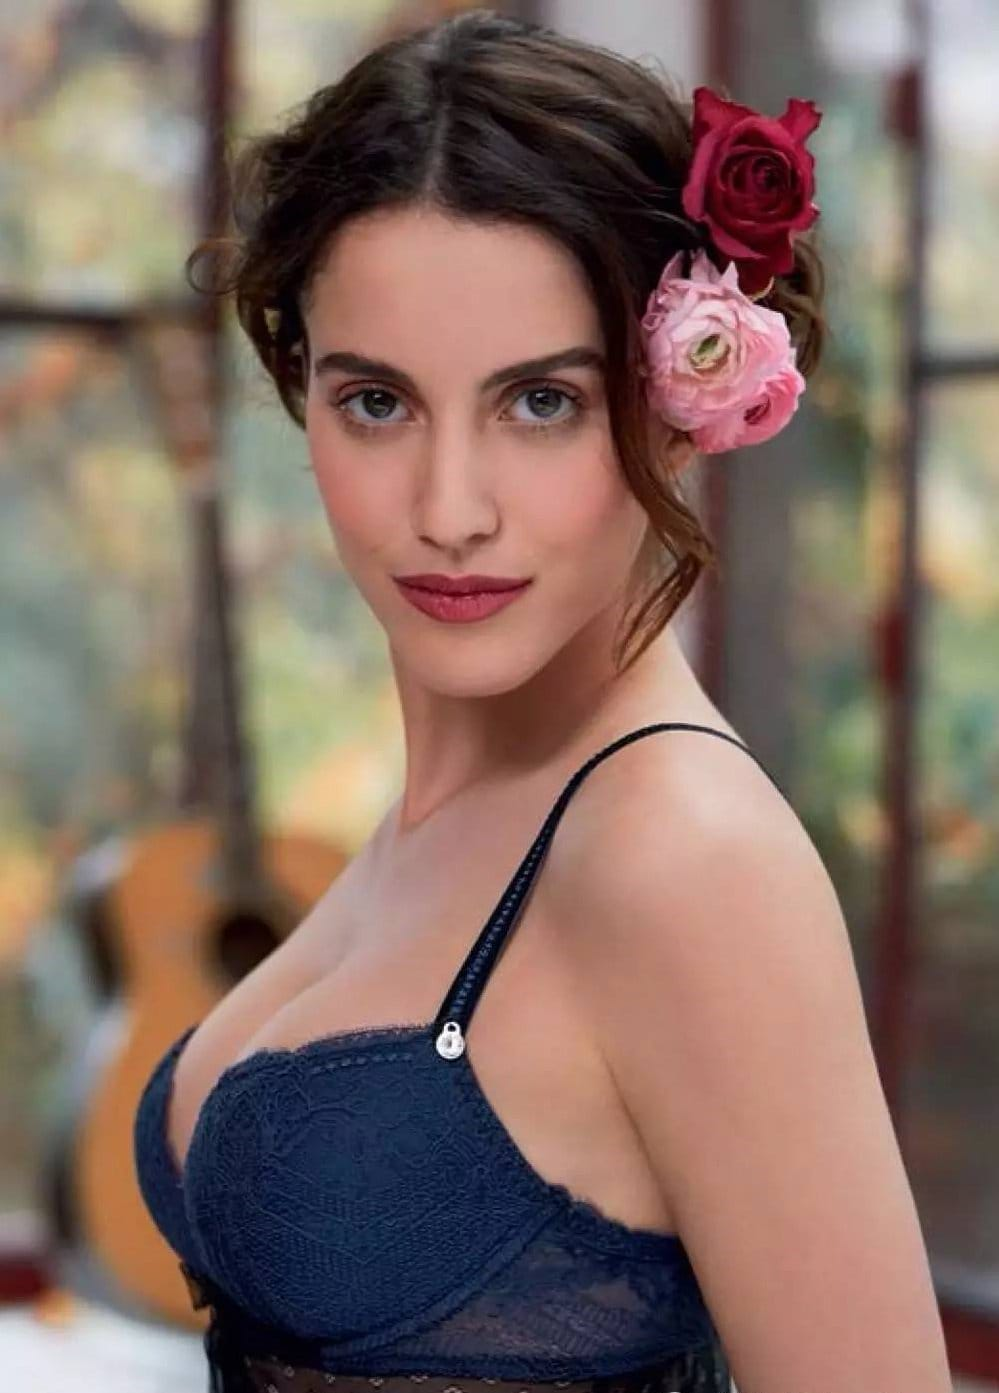 Ana Rotili